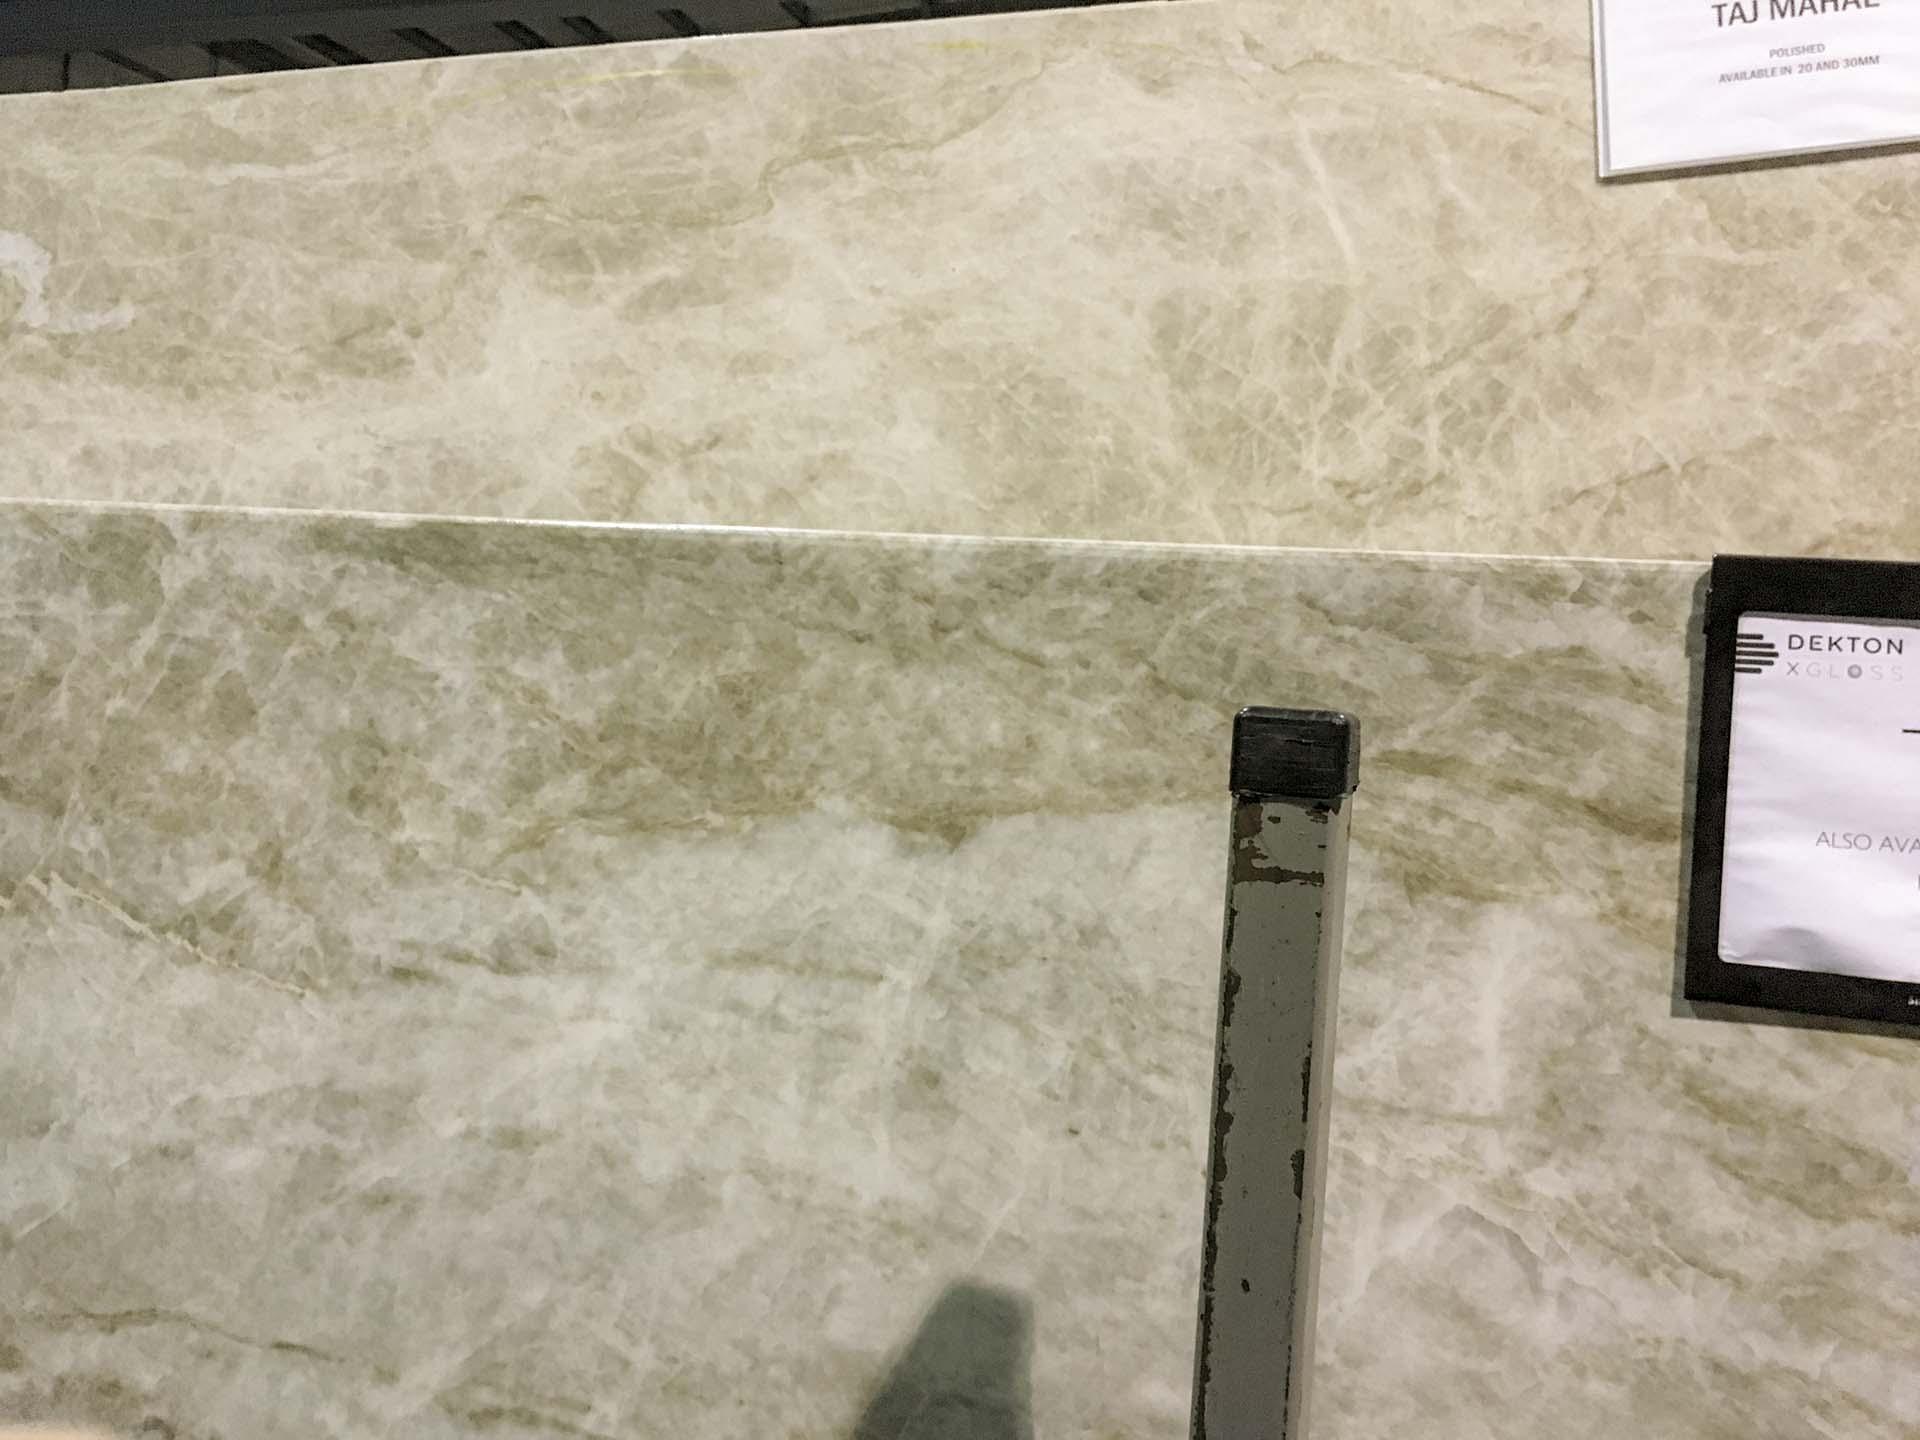 cosentino visit hook 2018 surrey quartz worktops silestone 203726